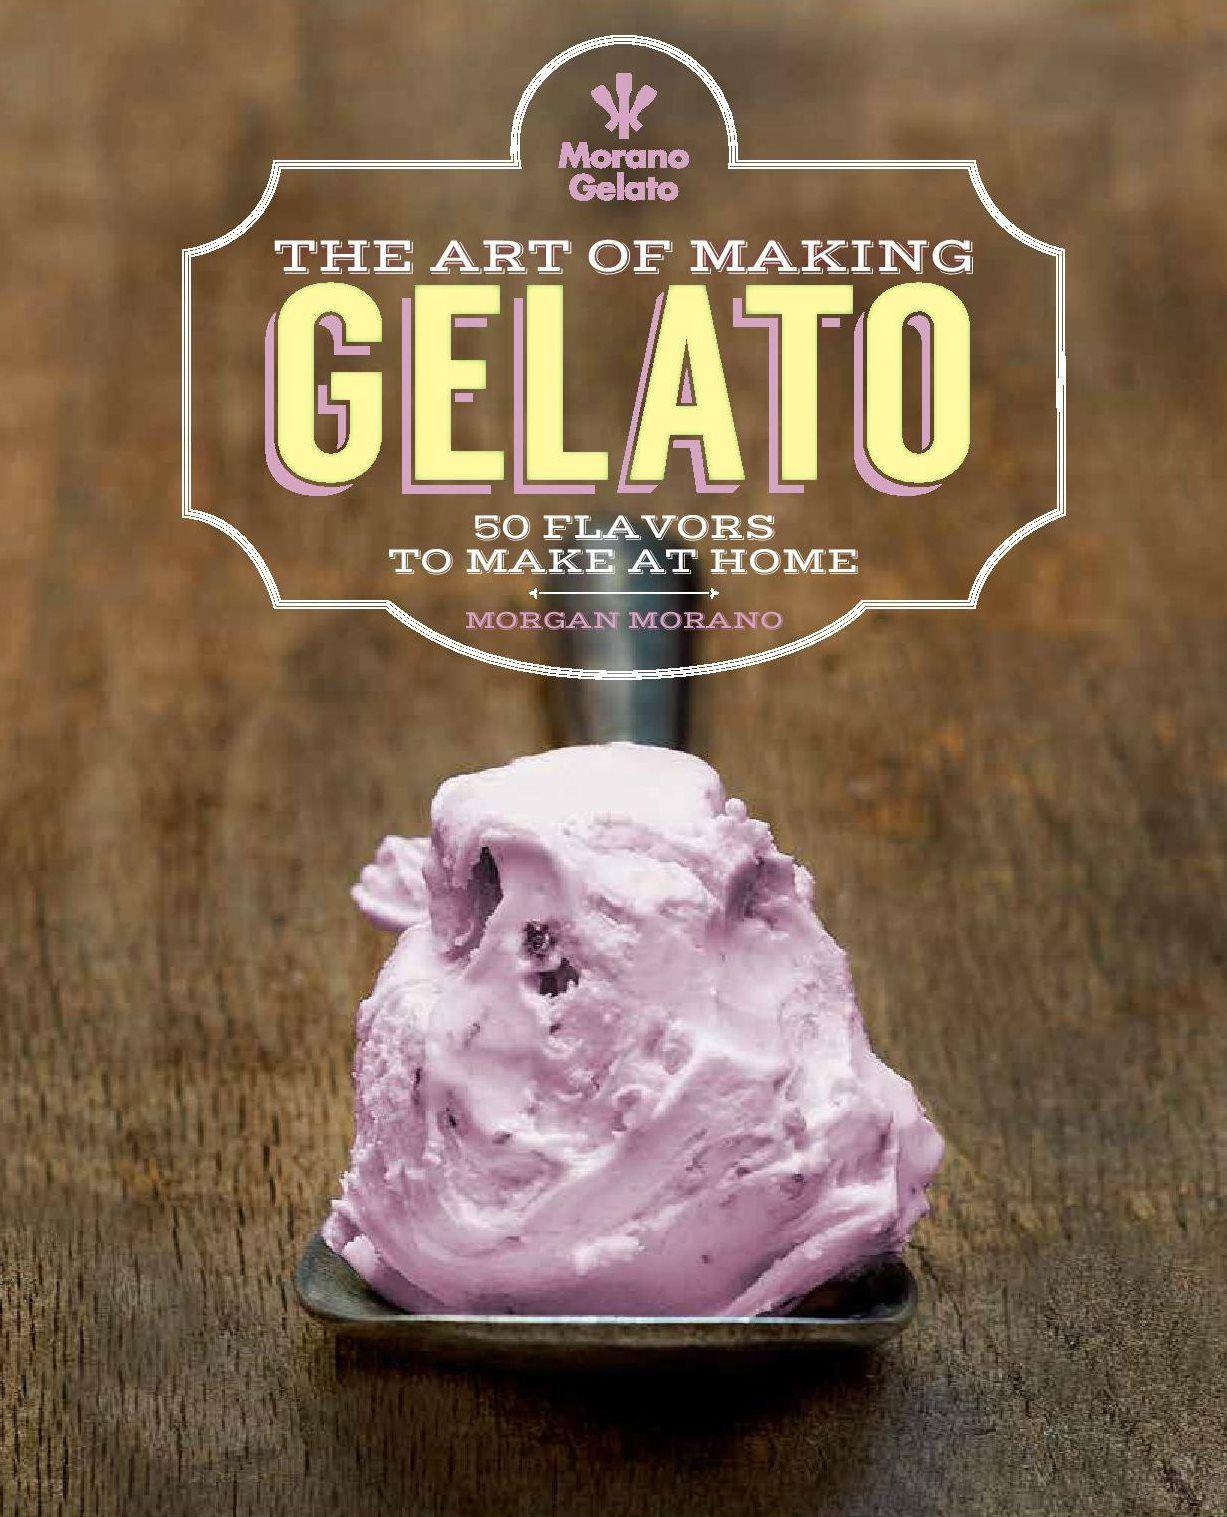 Easy to make gelato recipes